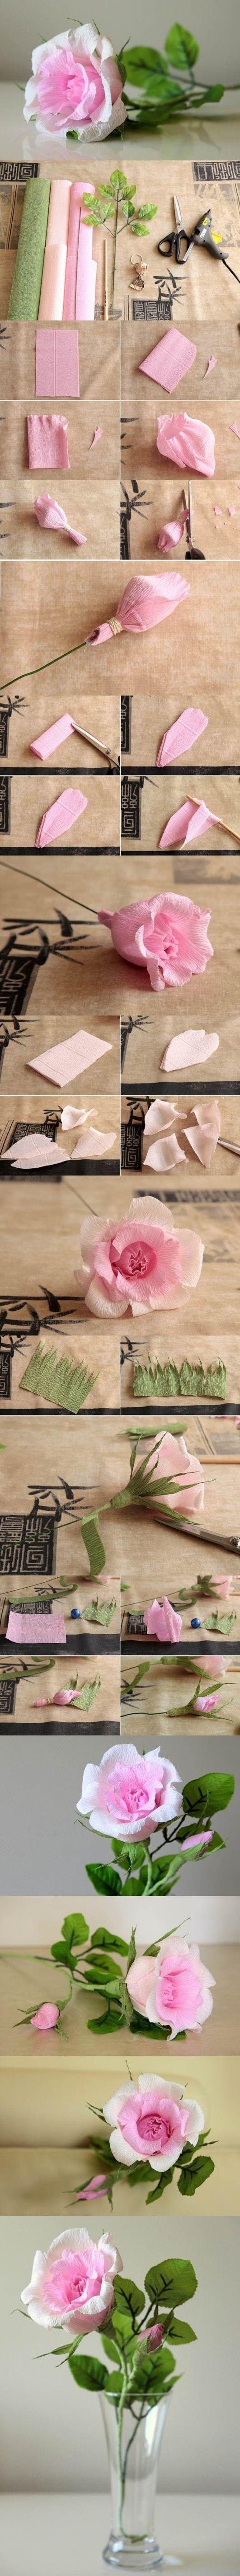 Skilled flower better life # # # beautiful handmade DIY tutorial paper art flowers, material: crepe paper